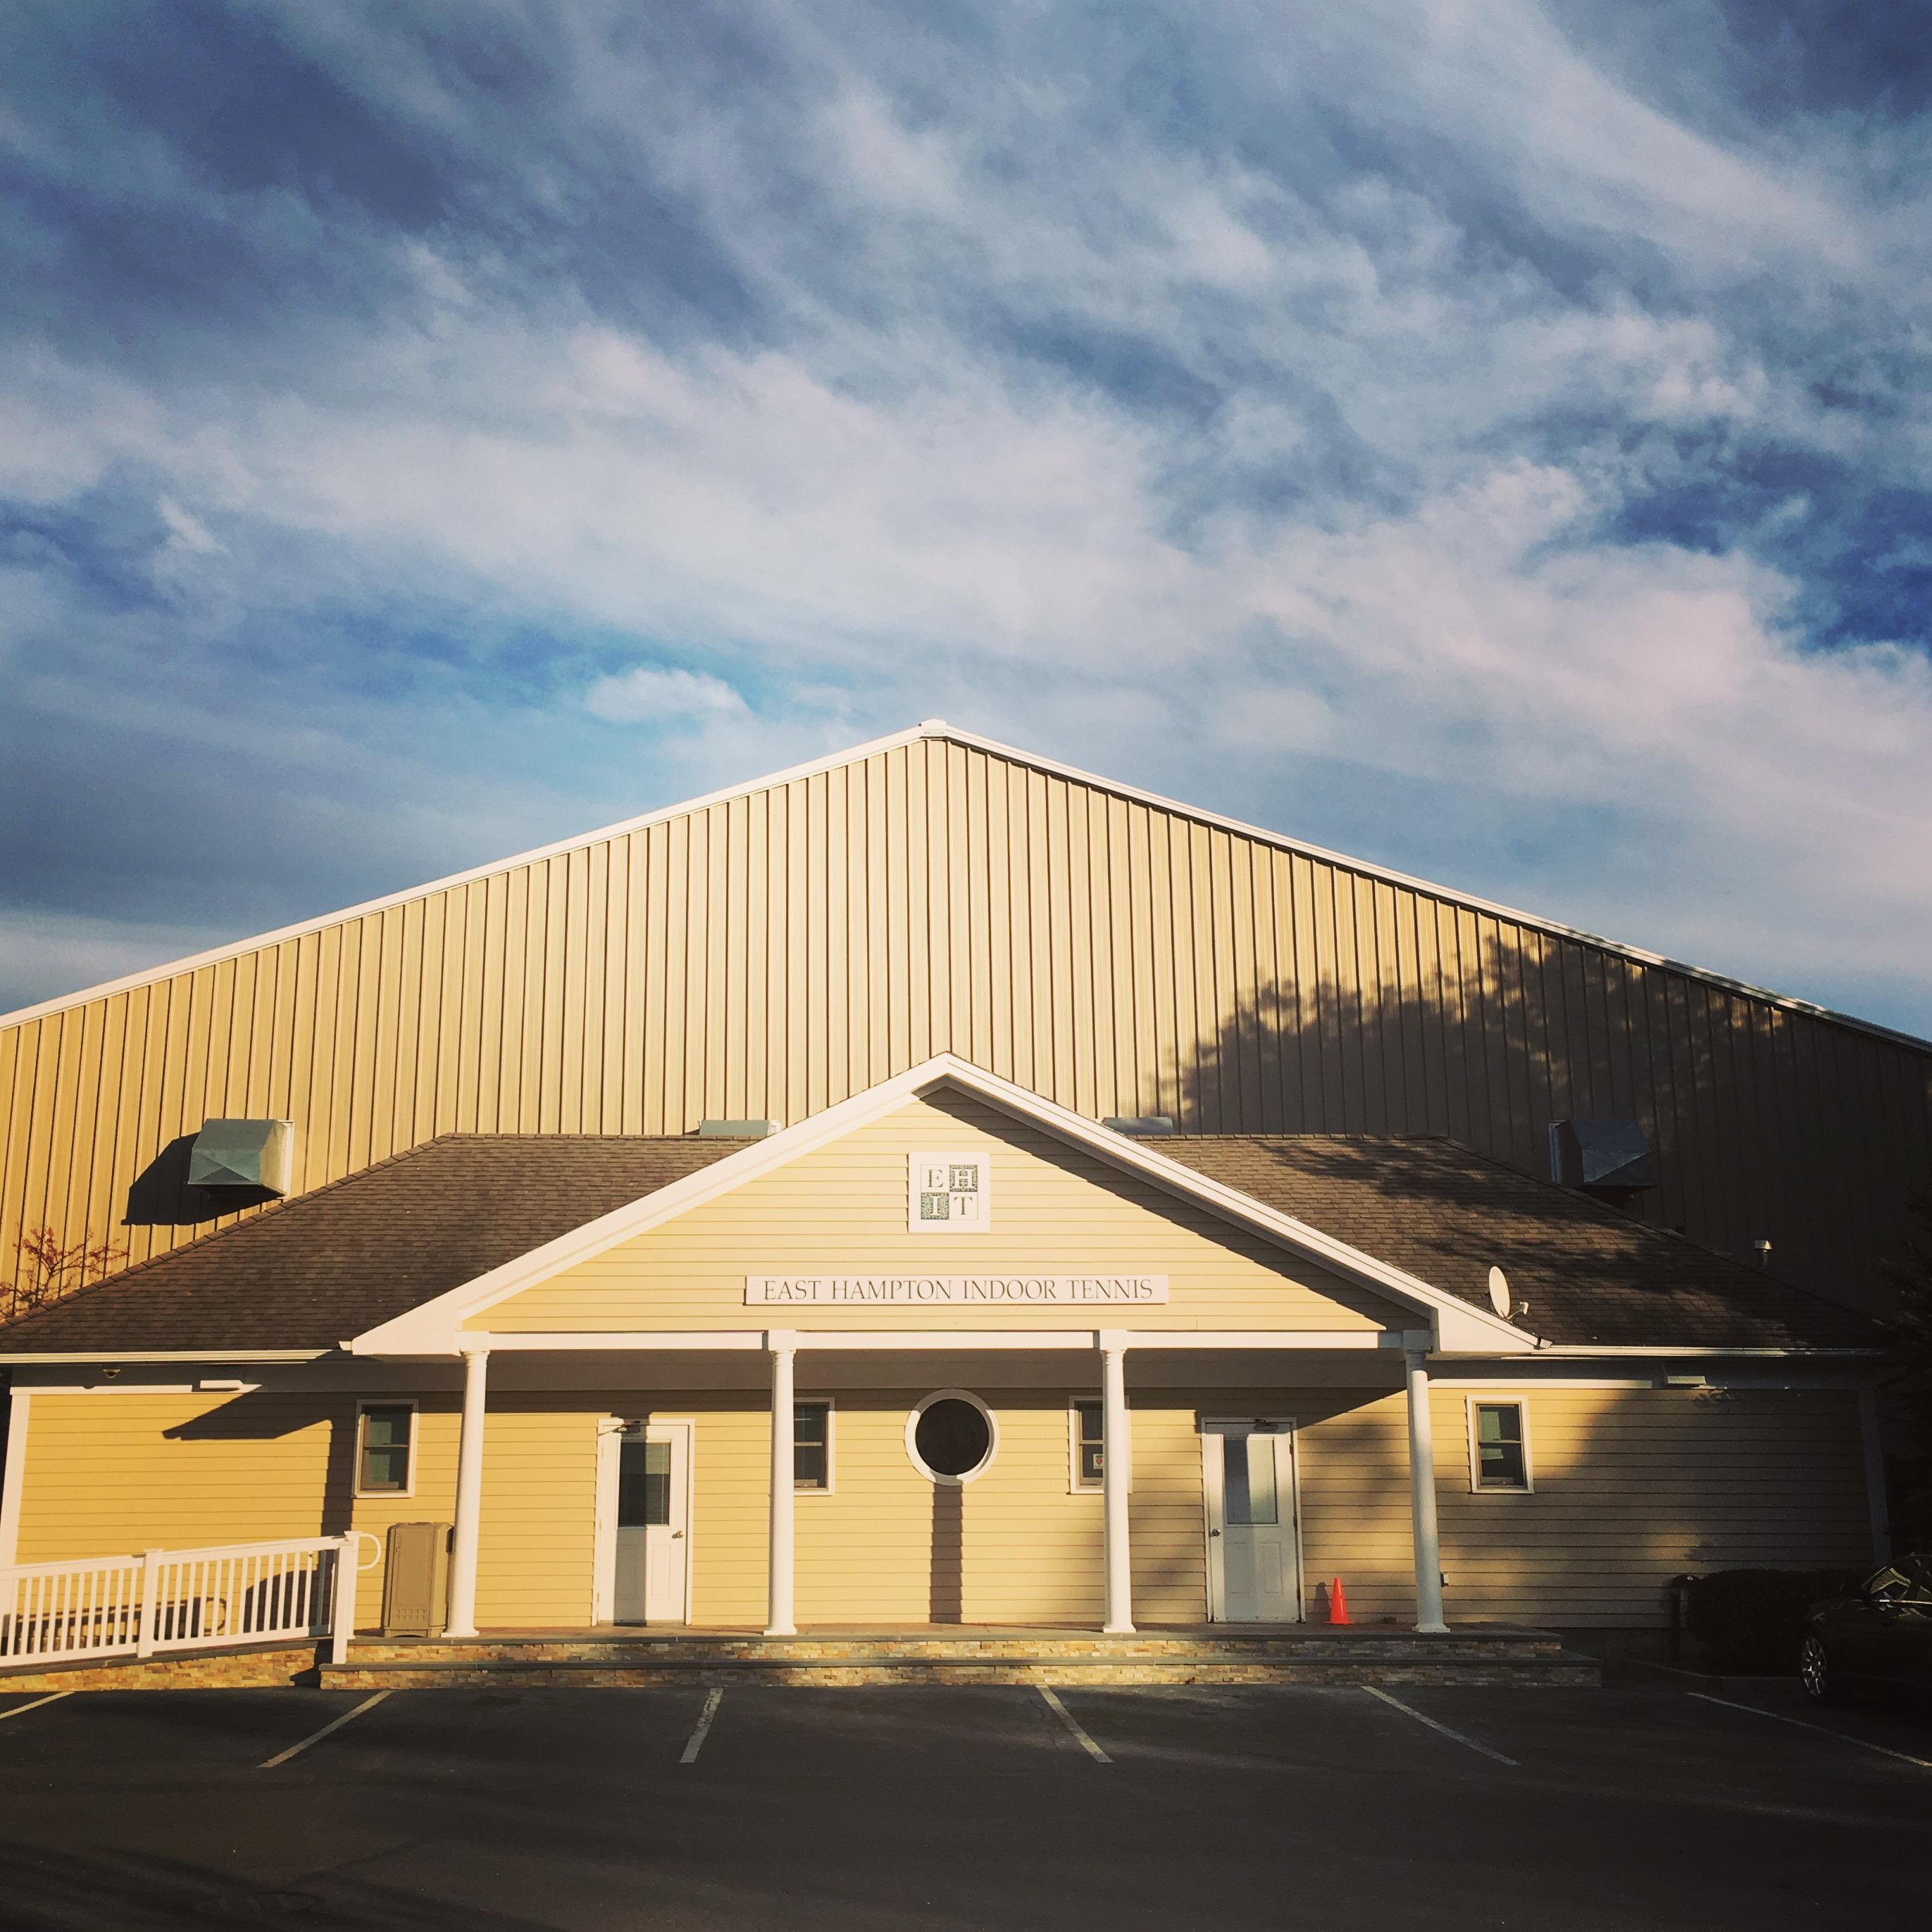 East Hampton Indoor Tennis - Tennis Club - East Hampton, NY